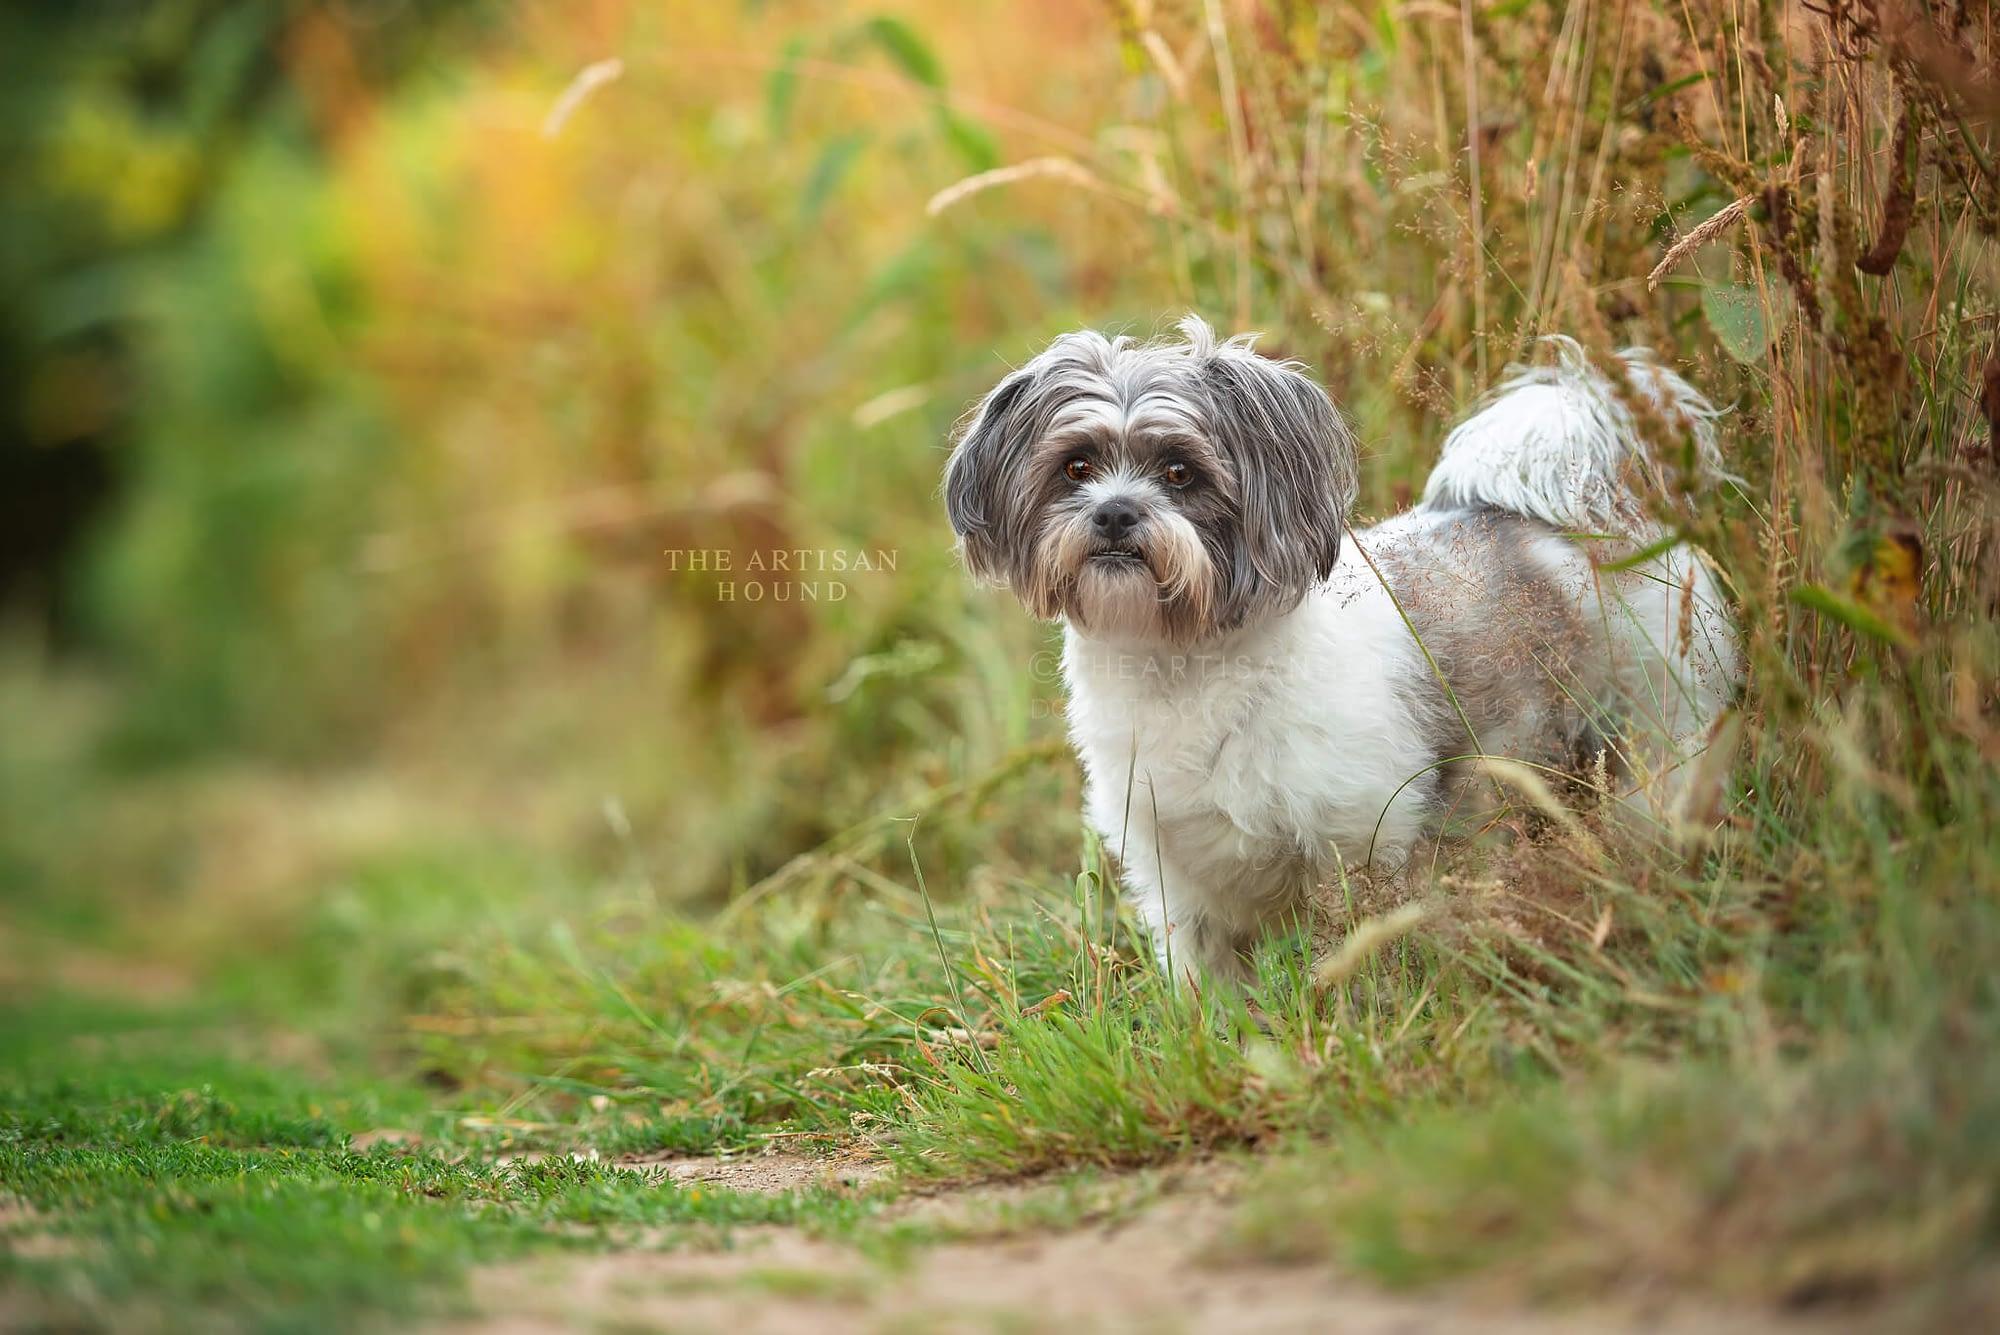 Little scruffy dog standing in dry summer grass